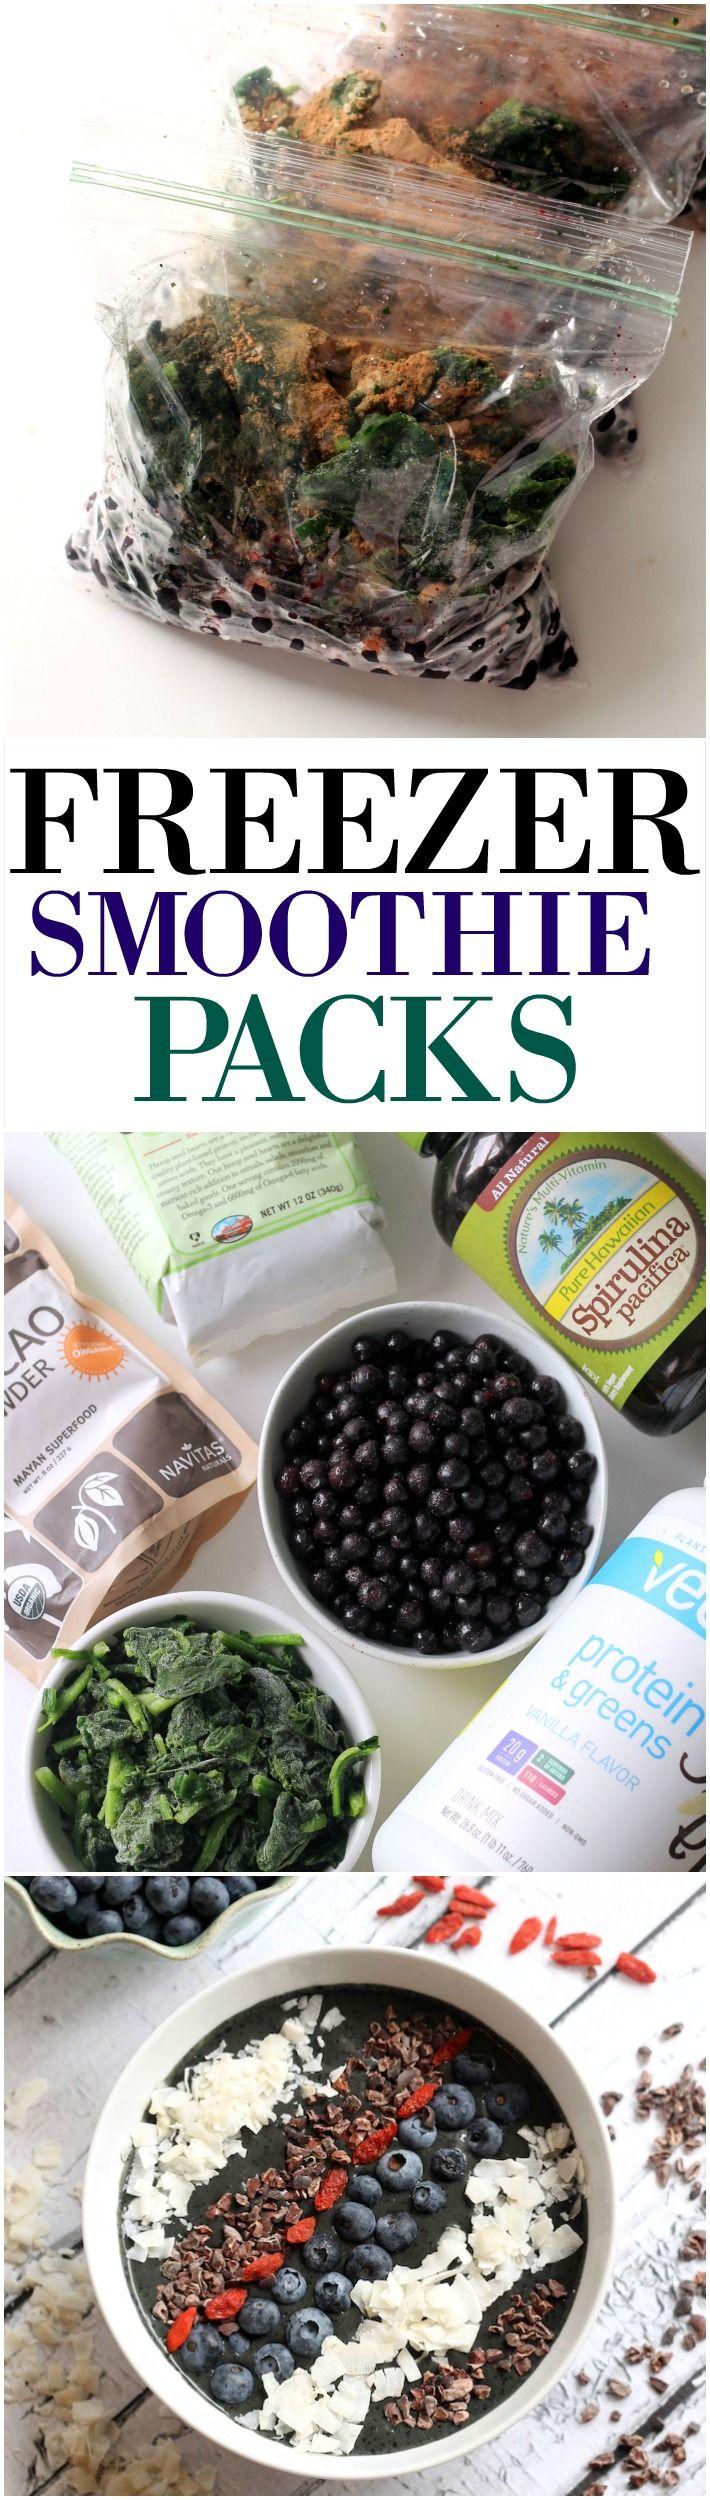 How to Make Freezer Smoothie Packs | Hummusapien